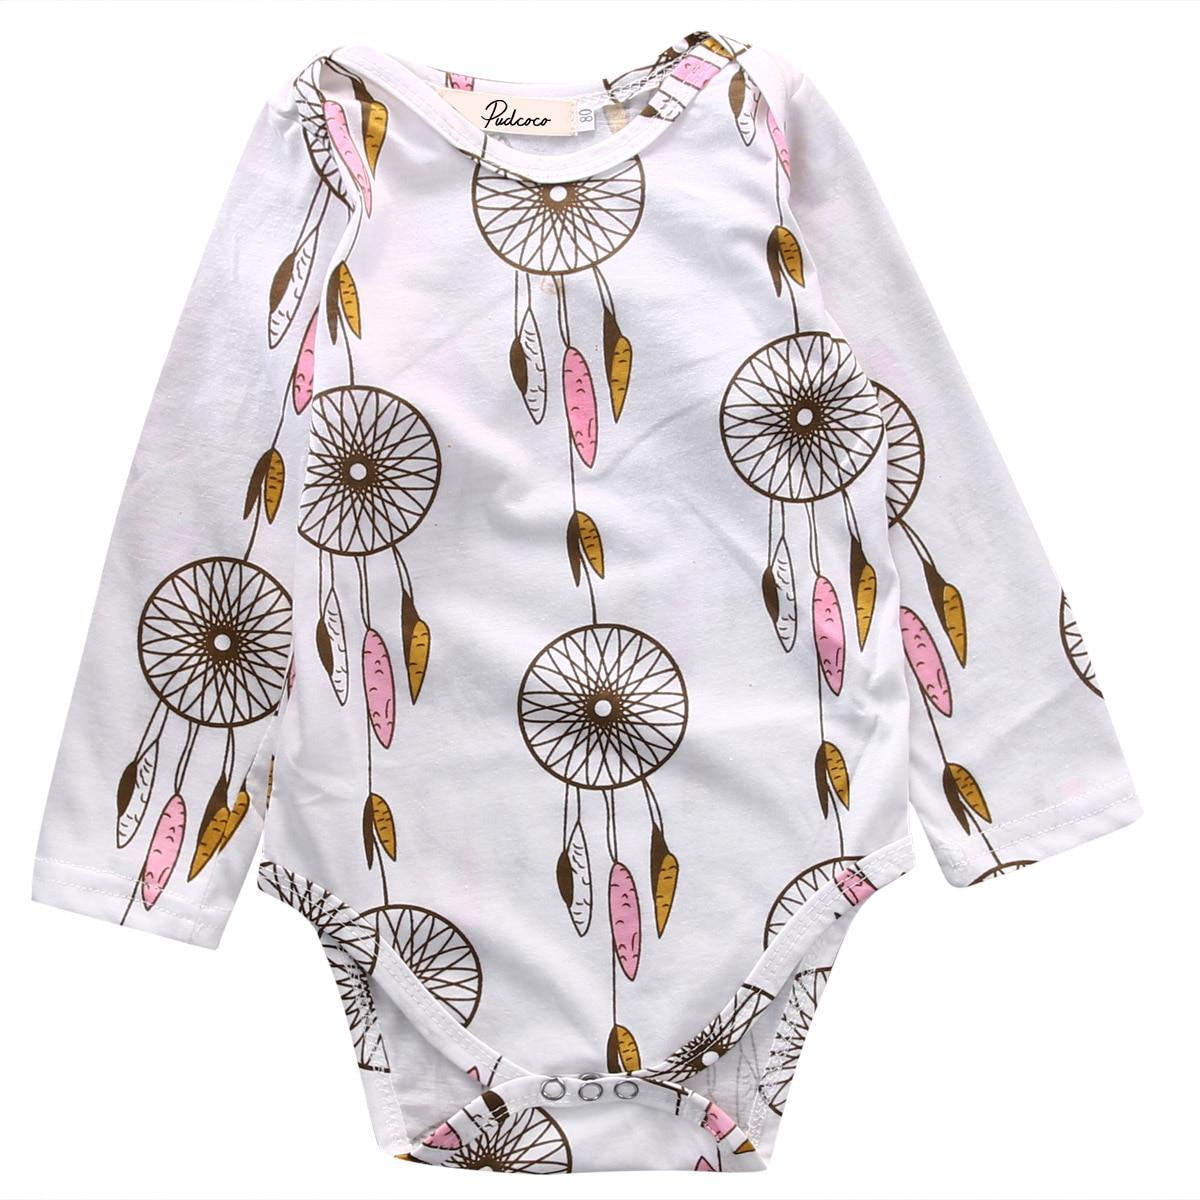 Newborn Baby Boy Girl Long Sleeve Bodysuit Clothes Dream Catcher Infant GIrl Print Jumpsuit Outfits